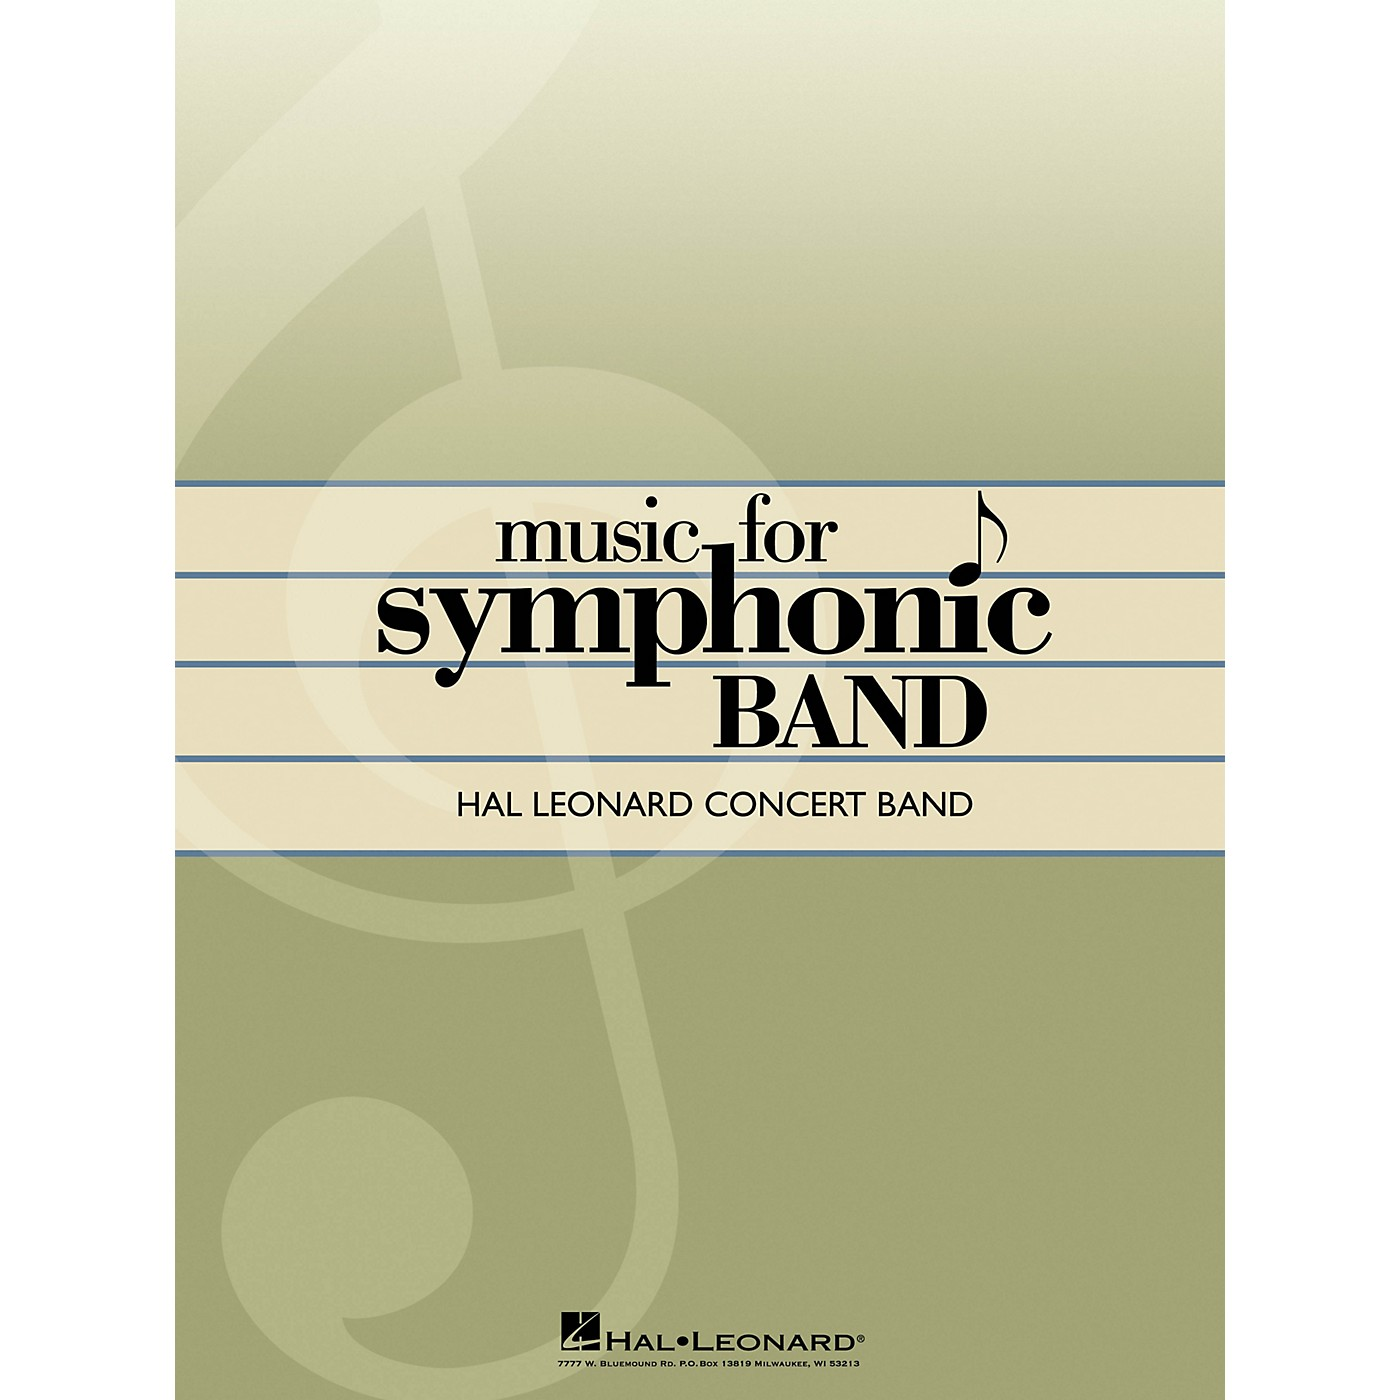 Hal Leonard Rodgers & Hammerstein's Oklahoma! Concert Band Arranged by John Edmondson thumbnail